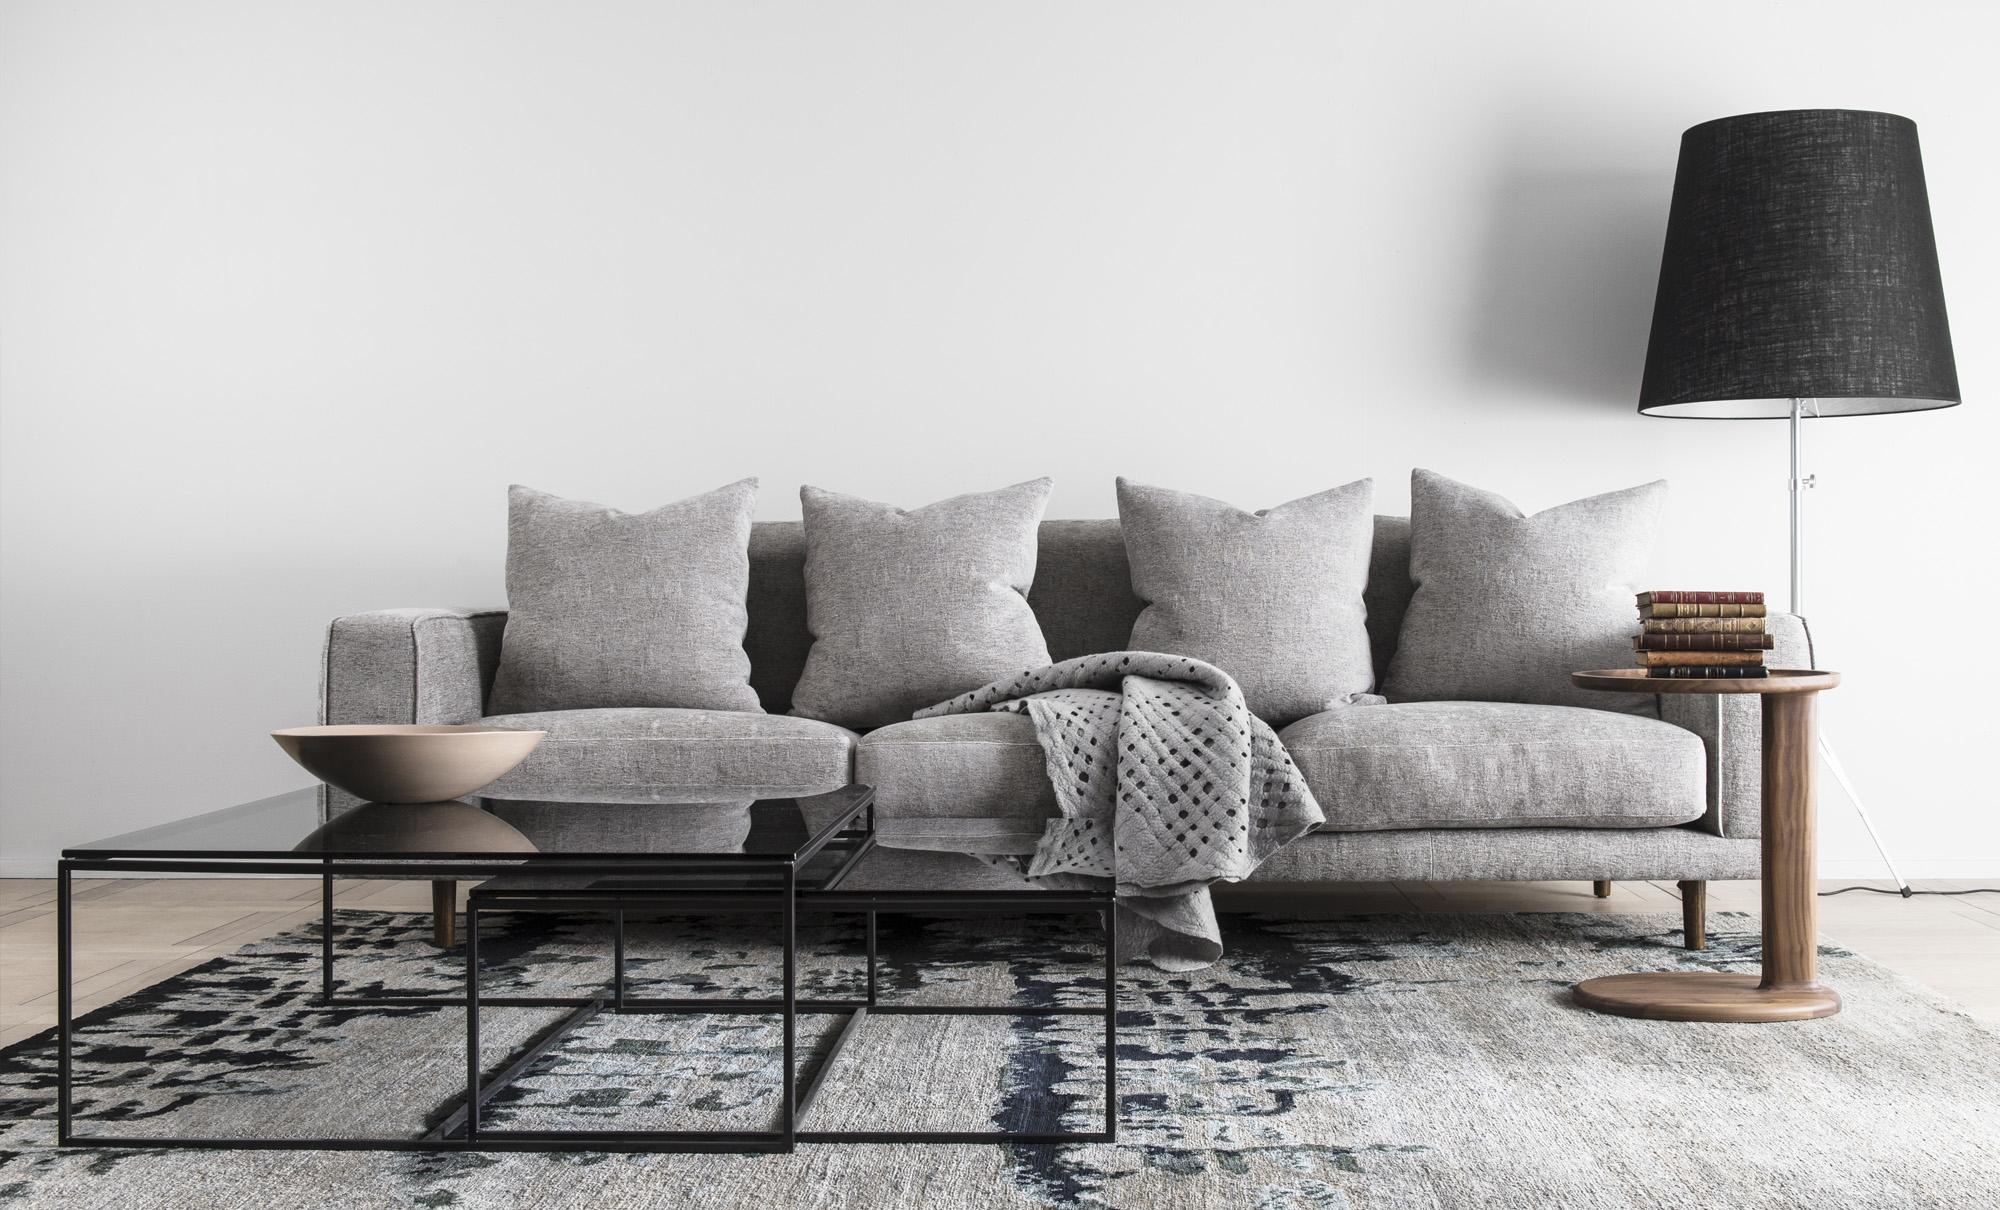 lounge sofa balkon upcycling bauen via dawandacom with lounge sofa balkon finest inspiration. Black Bedroom Furniture Sets. Home Design Ideas